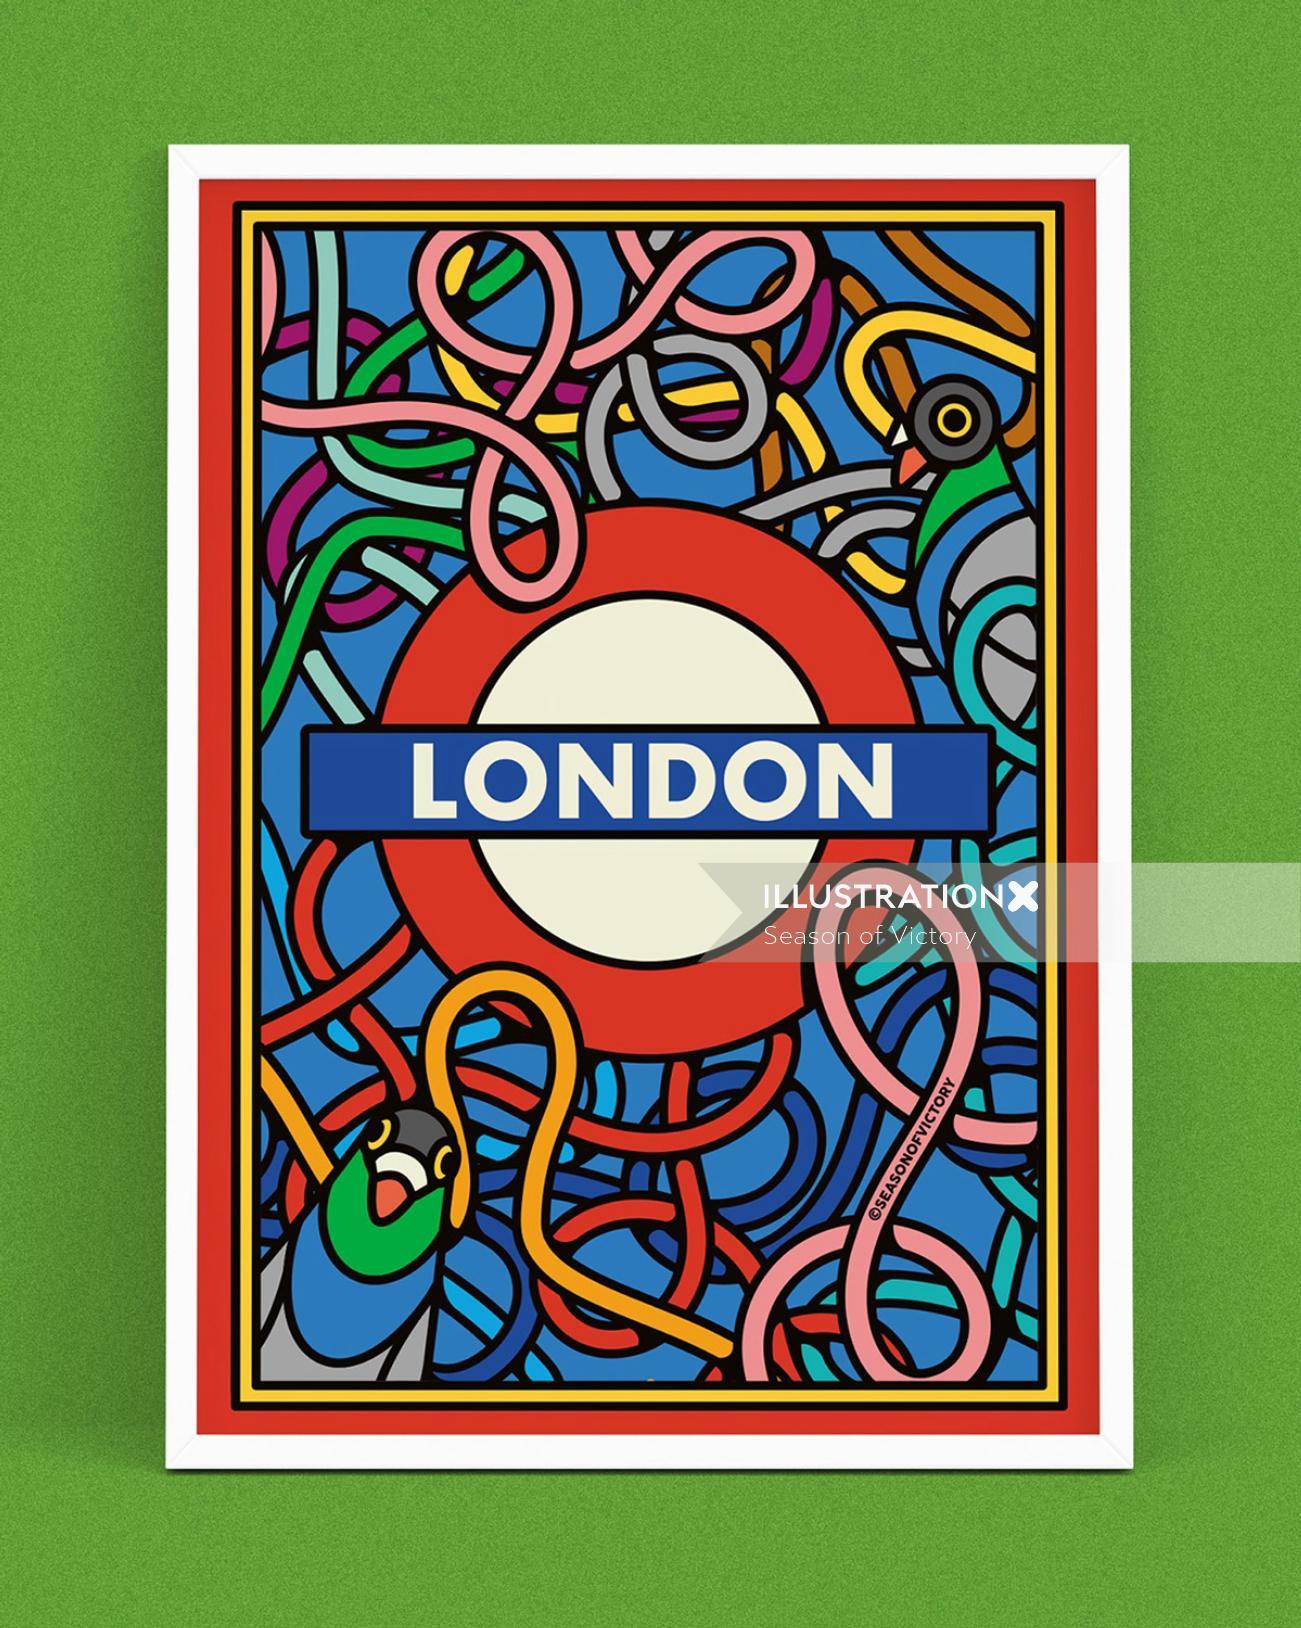 pigeons, travel, commute, transport, train, moquette, cover art, poster, london underground, london,